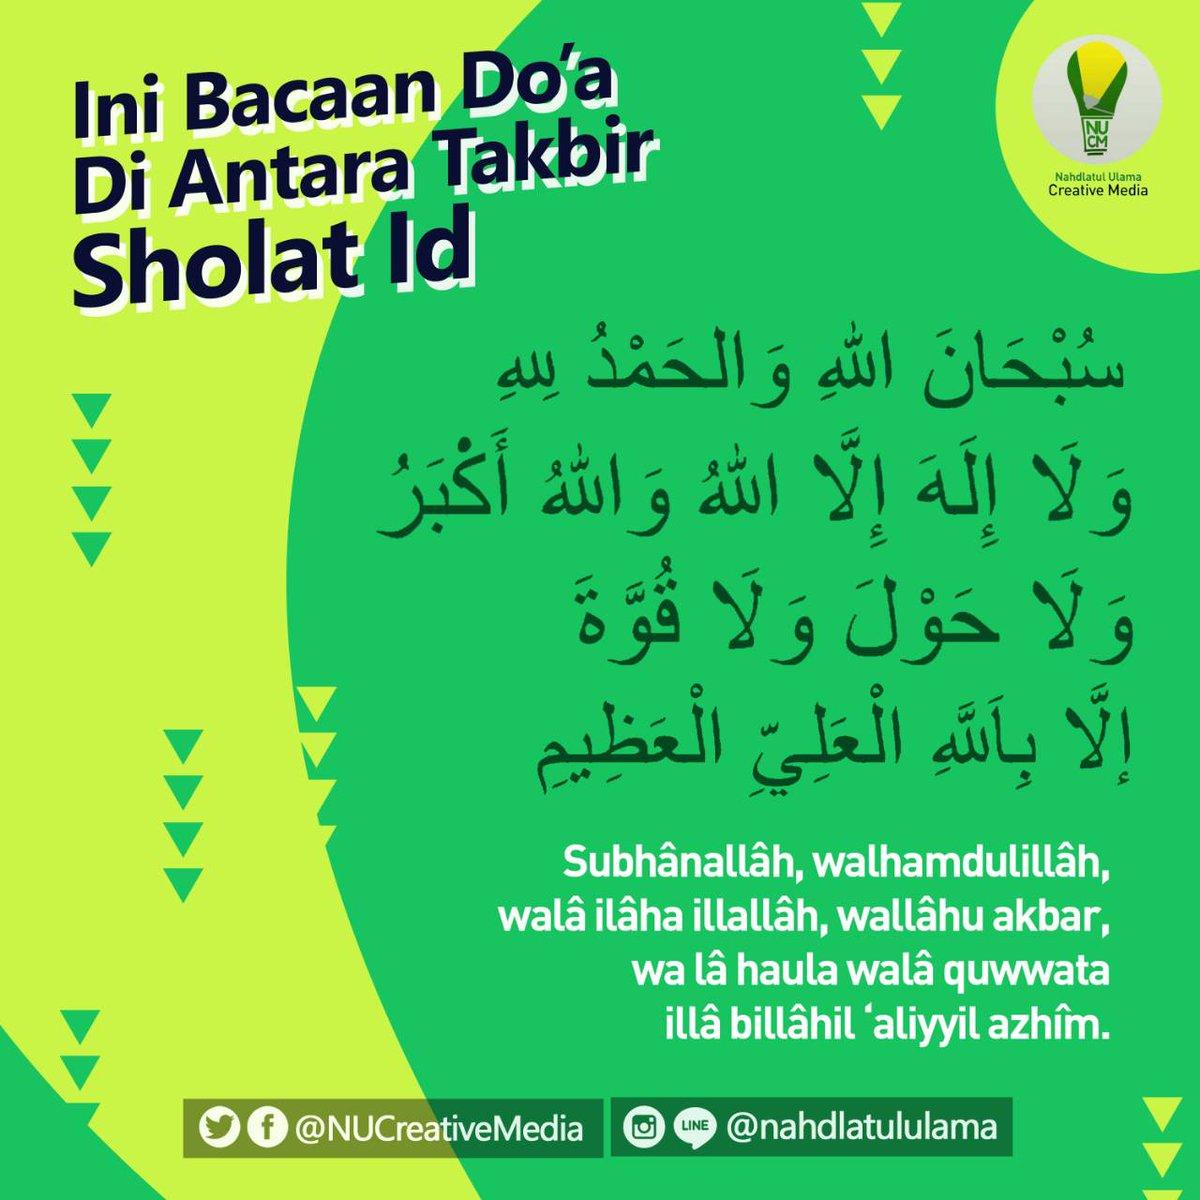 Takbir Sholat Idul Fitri